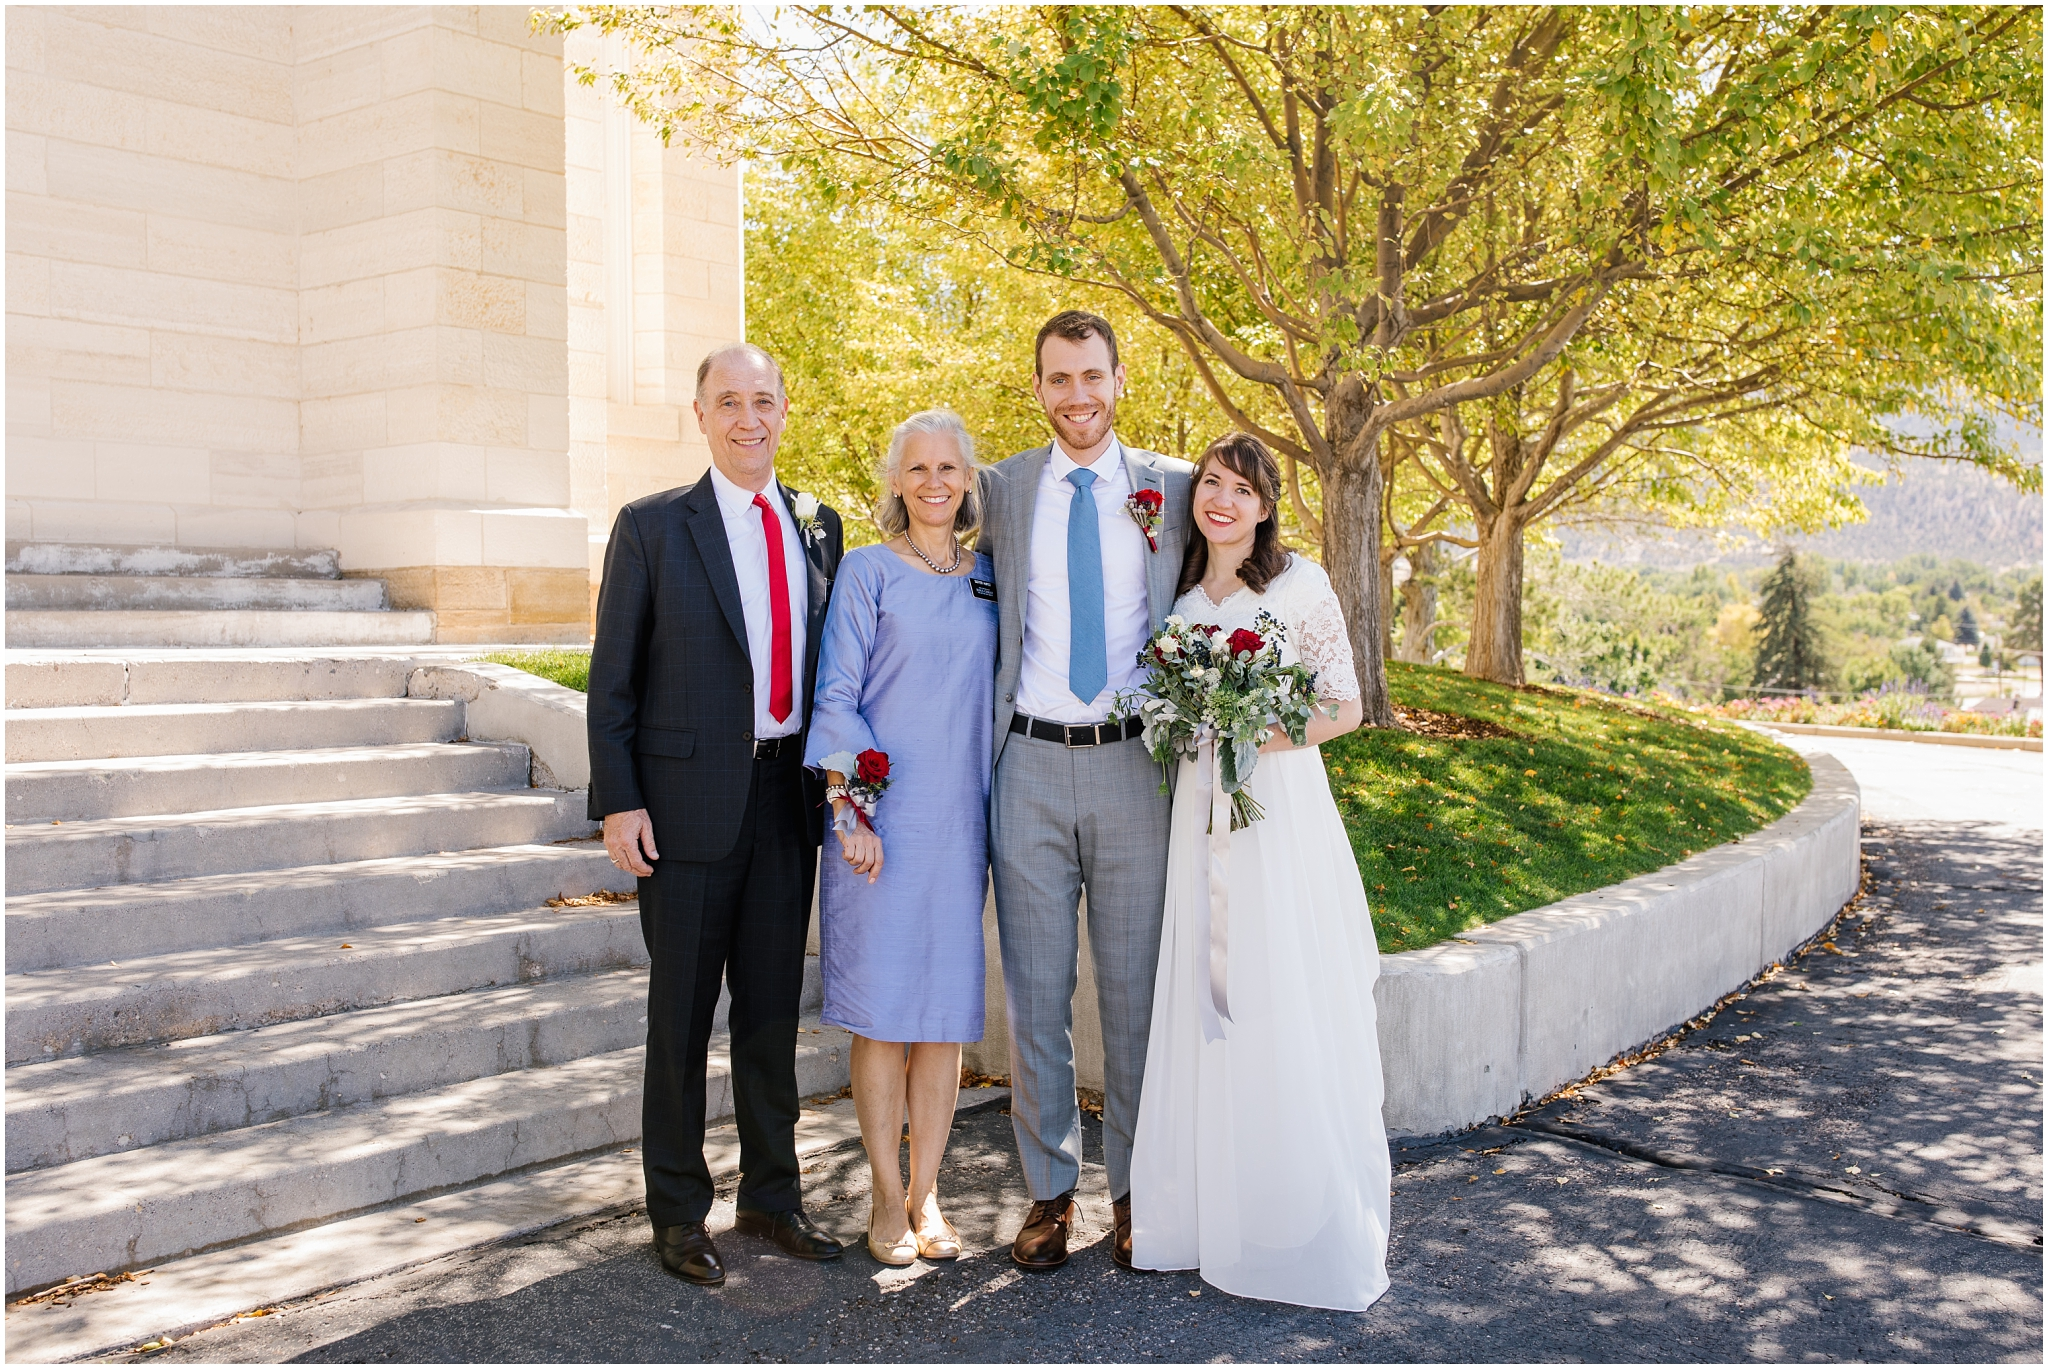 BrynneWinston-67_Lizzie-B-Imagery-Utah-Wedding-Photographer-Utah-County-Manti-Temple.jpg